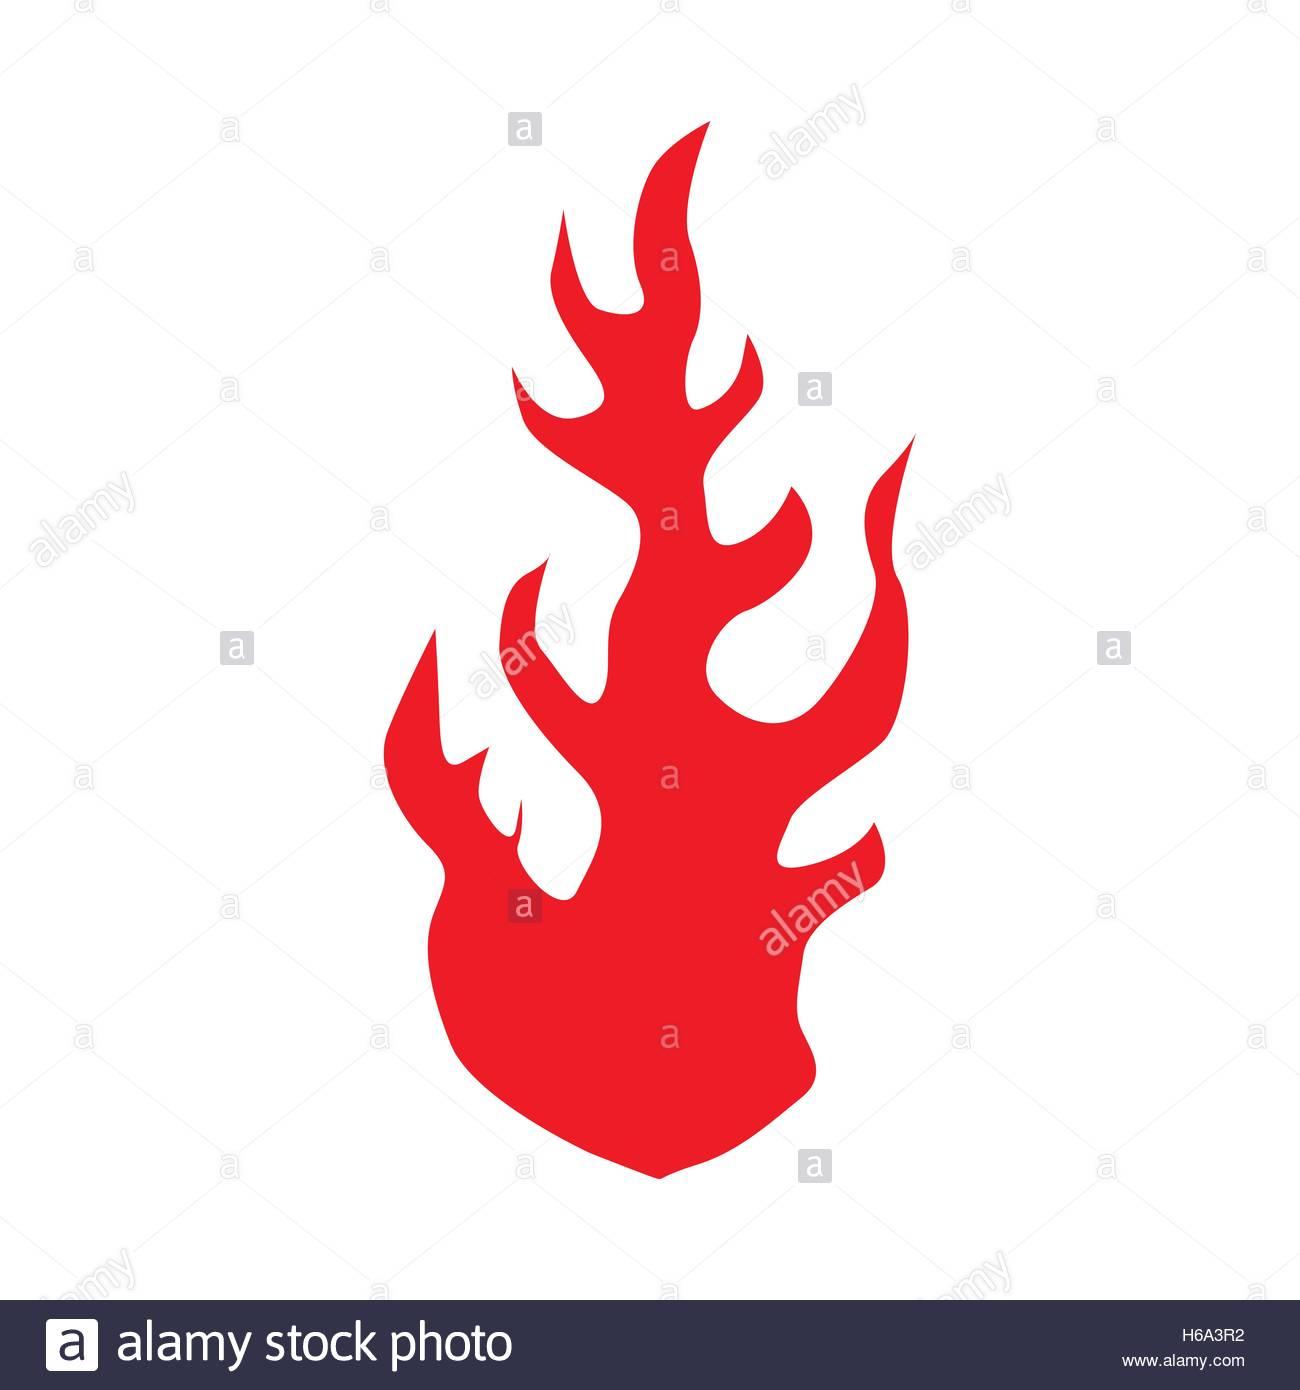 1300x1390 Fire Flames Silhouette Stock Vector Art Amp Illustration, Vector